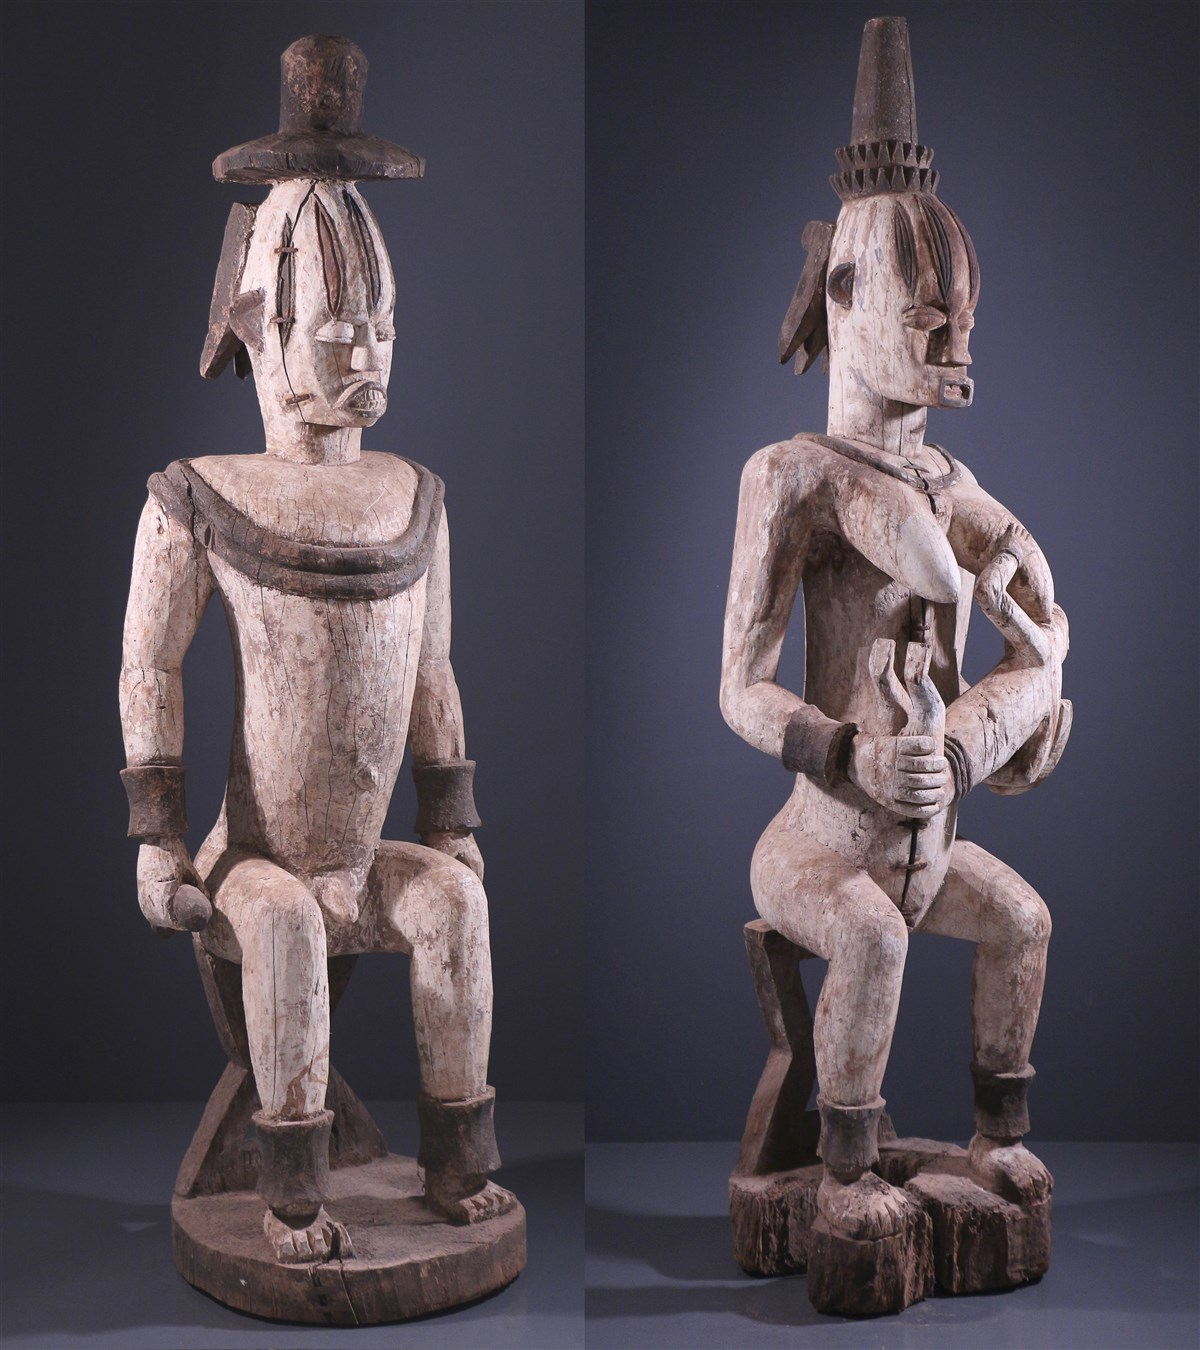 Paire de grandes statues Urhobo Owedjebo - Art africain